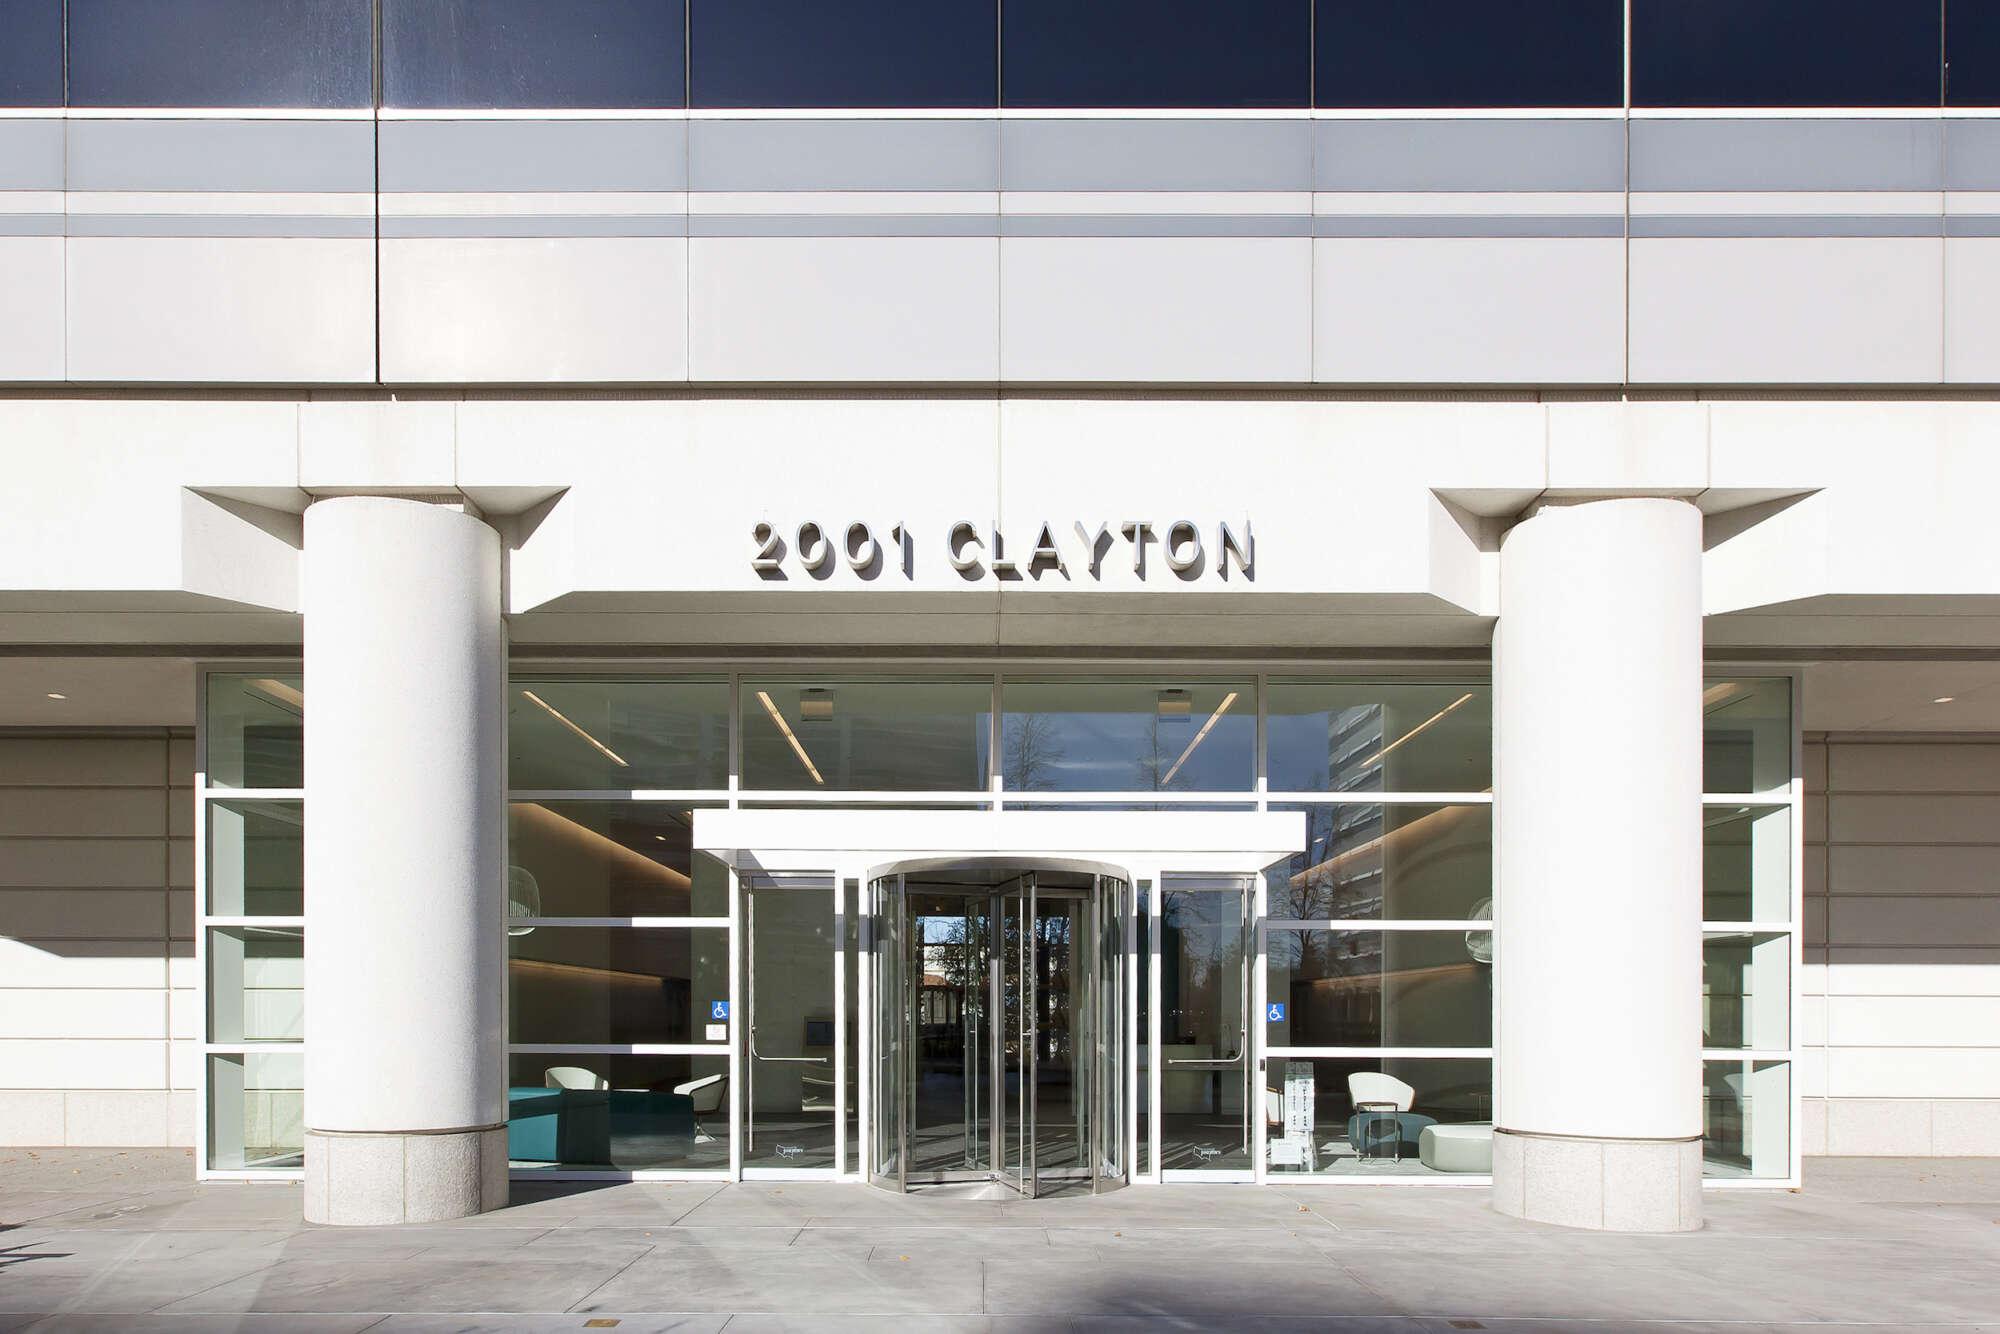 2001 Clayton exterior lobby entrance